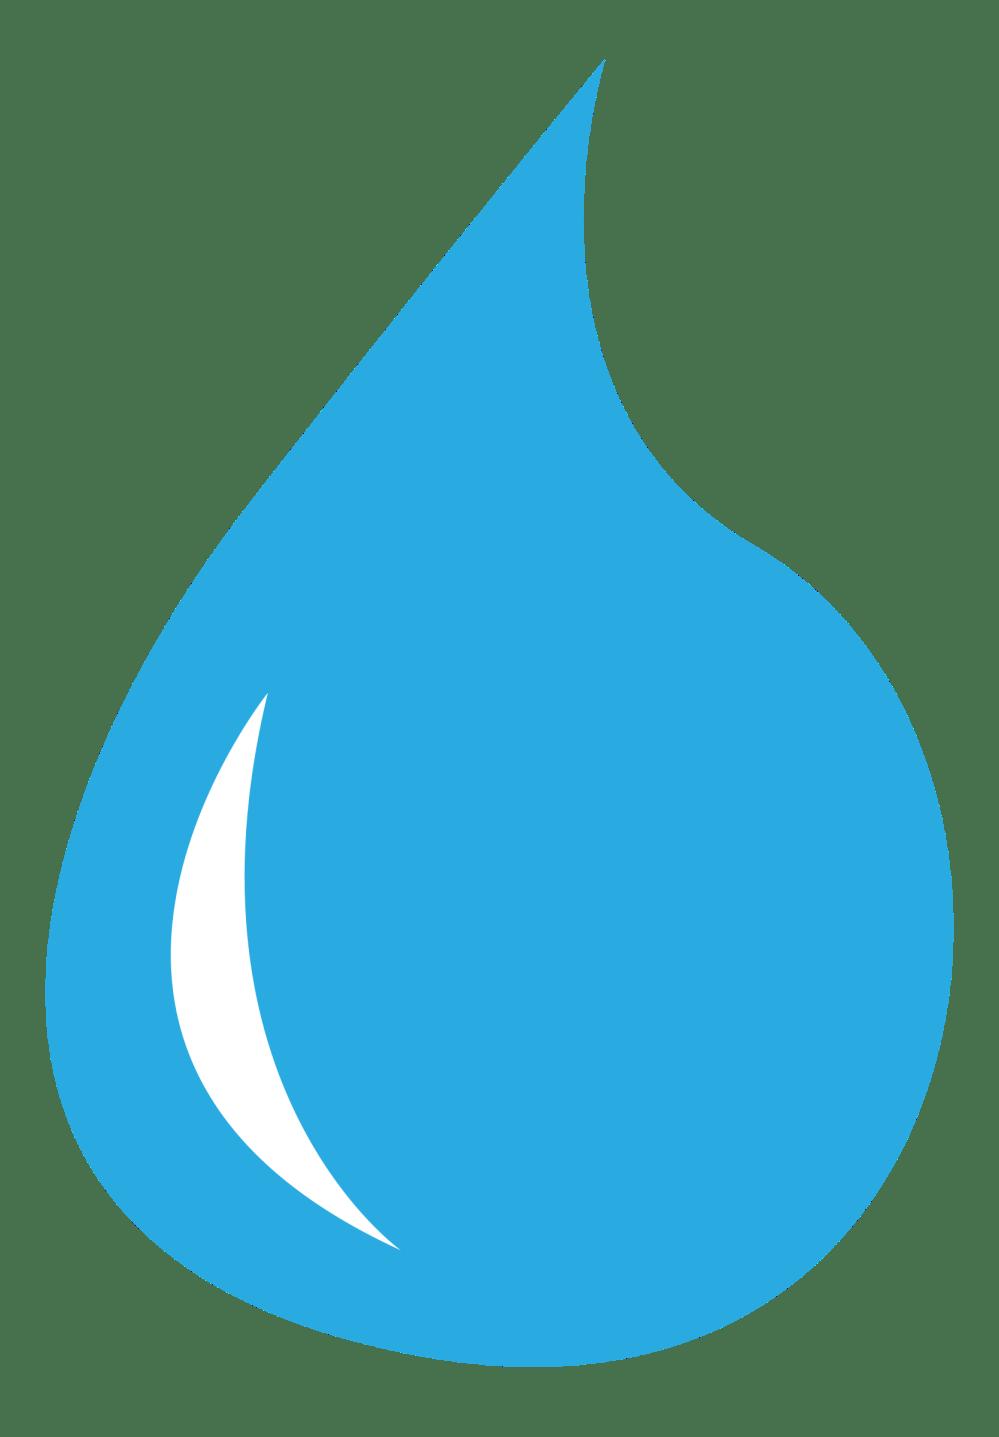 medium resolution of water droplet clipart